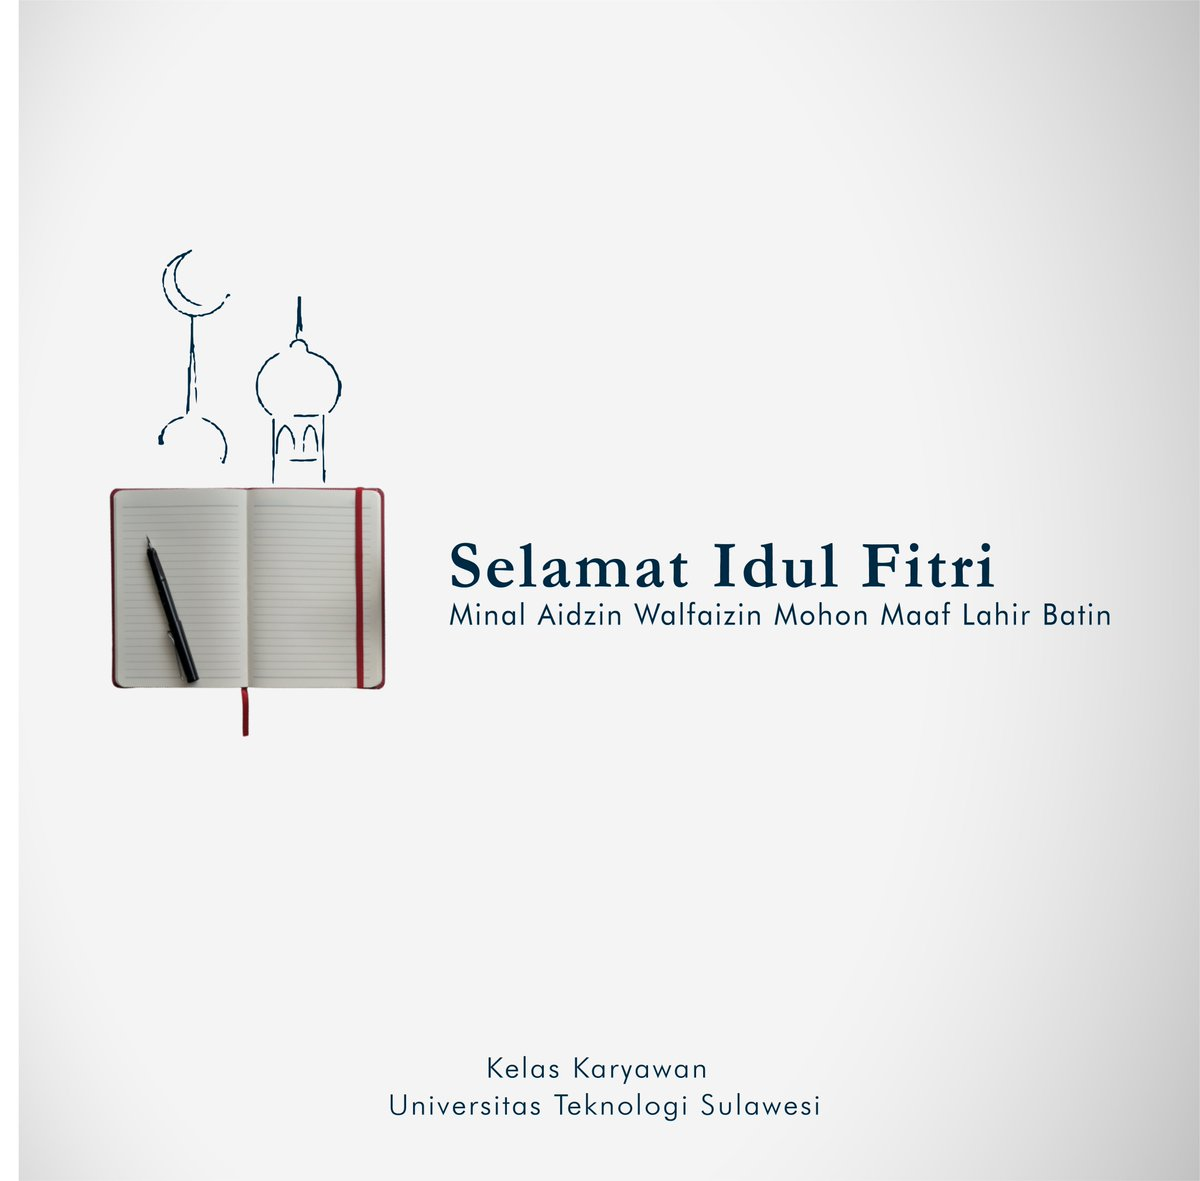 Segenap sivitas Akademika Kelas Karyawan Universitas Teknologi Sulawesi mengucapkan Selamat Hari Raya Idul Fitri 1441 Hijriah, kembali putih, kembali suci dan mari kembali kepada fitrah sebagai hamba yang taat. Mari saling memaafkan. #makassarinfo #makassarterkini #makassarcity pic.twitter.com/TyJFiusgTQ